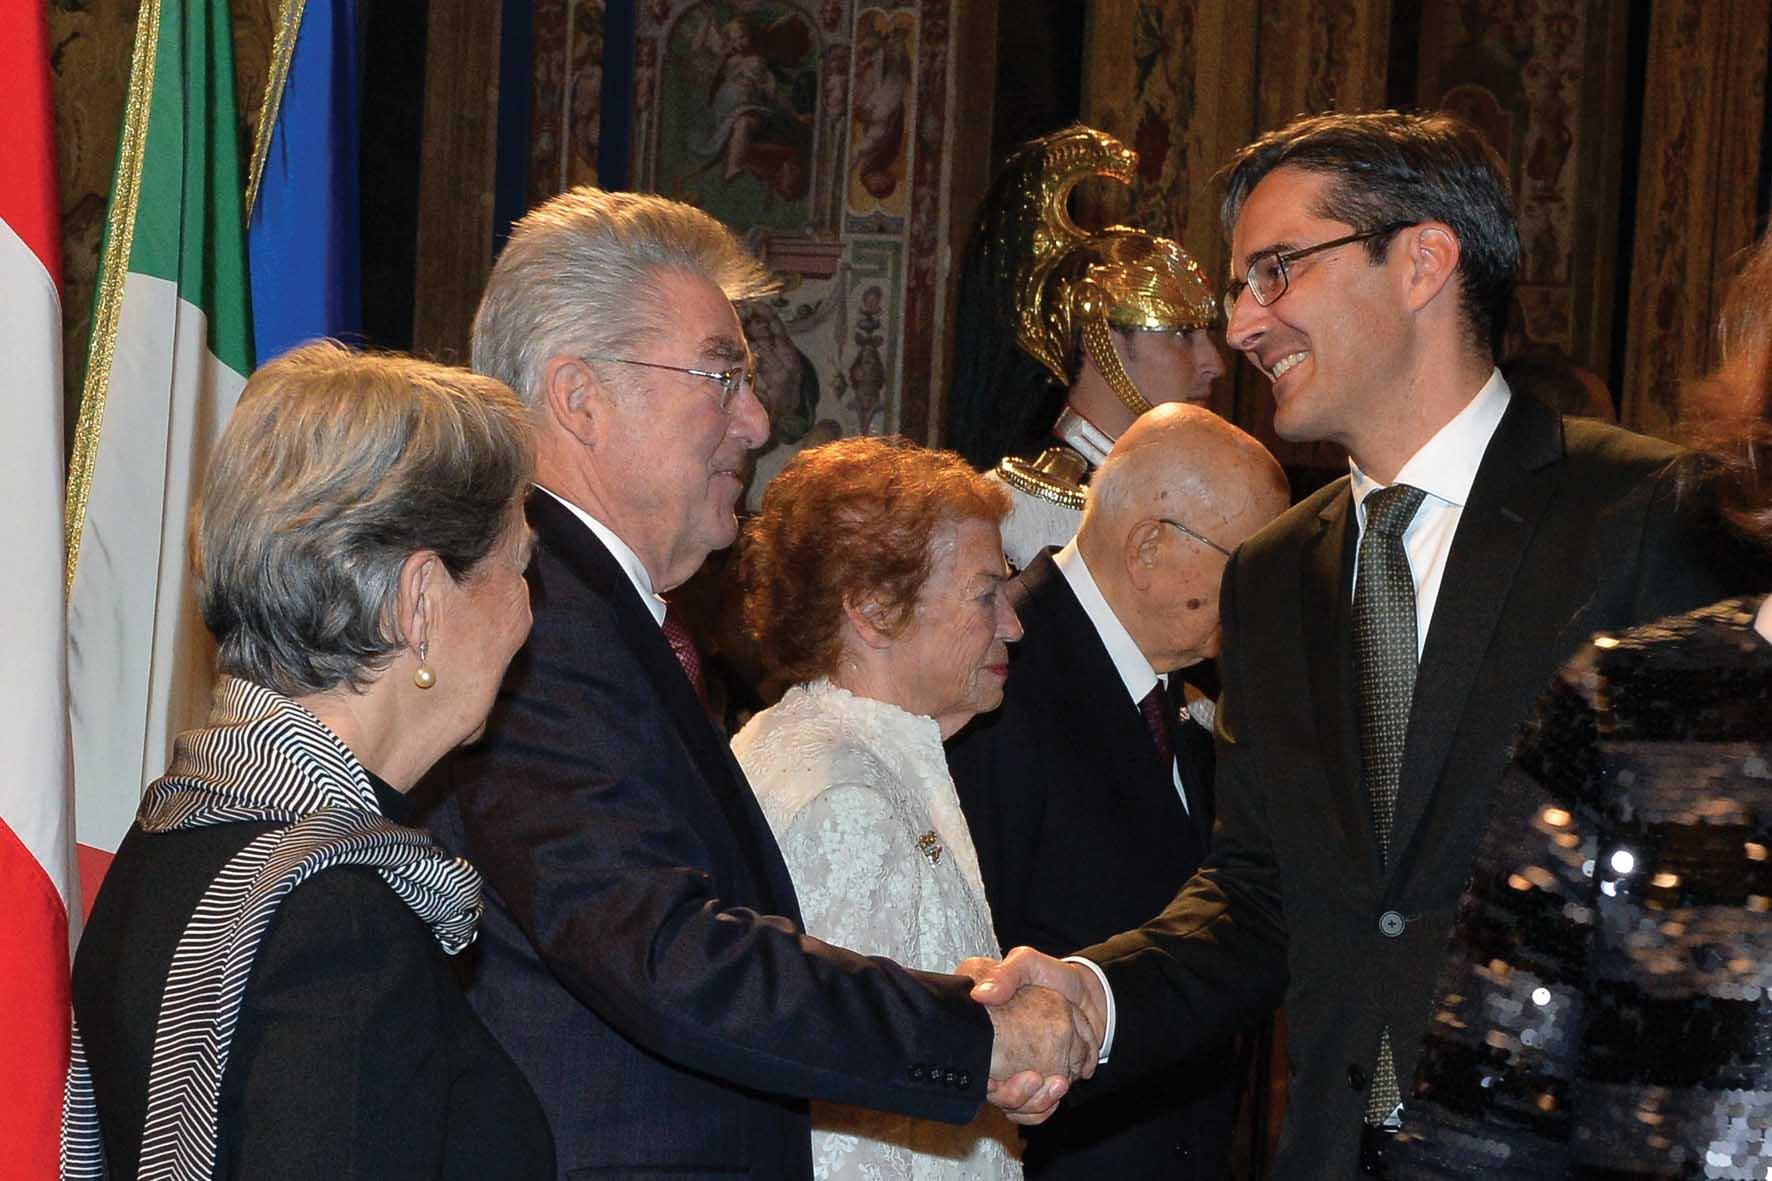 PAB ricevimento quirinale Napolitano presidente Austrai Fischer e Kompatscher 1